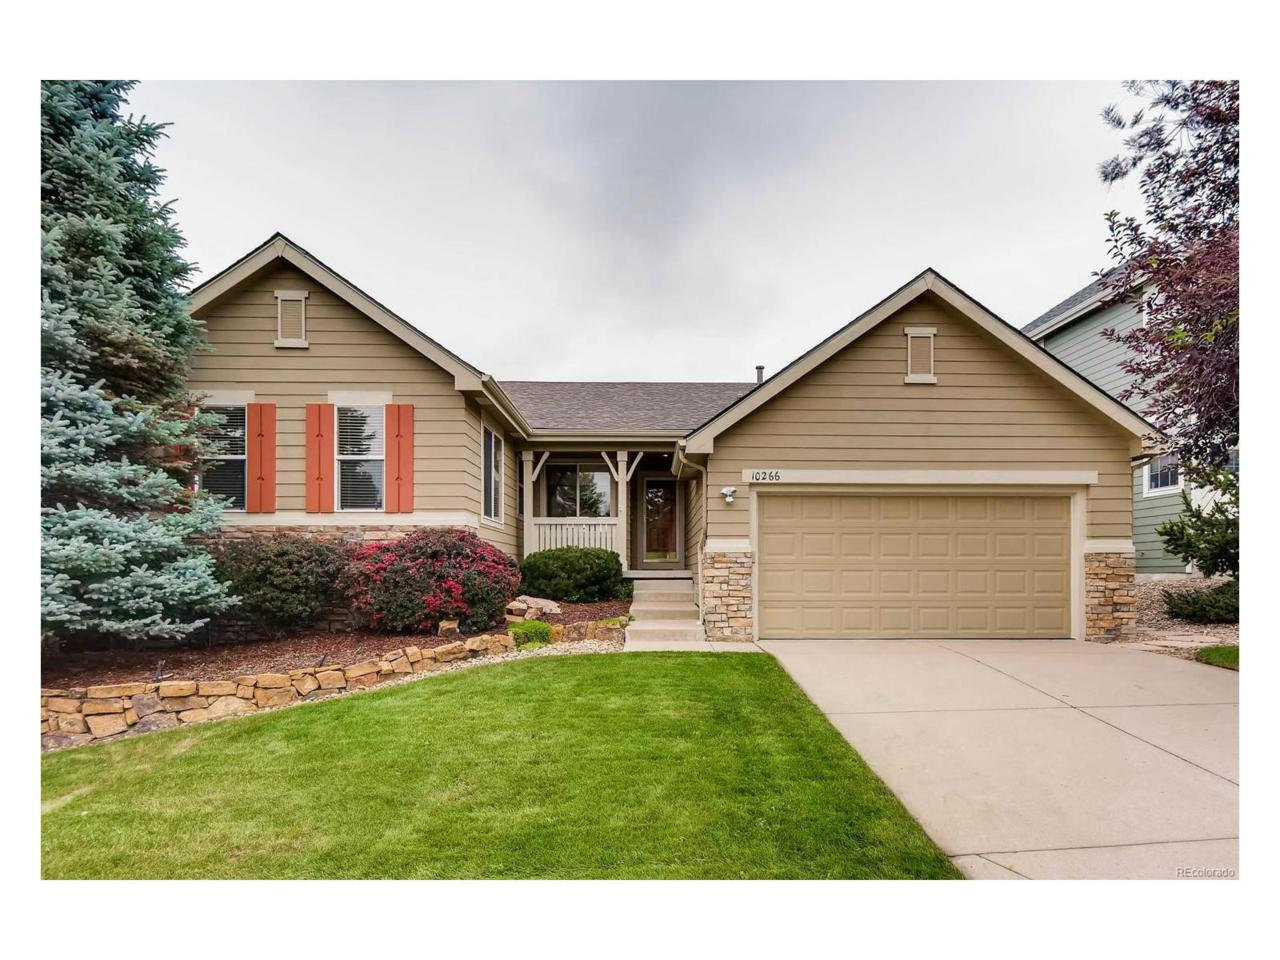 10266 Rustic Redwood Way, Highlands Ranch, CO 80126 (MLS #4000053) :: 8z Real Estate